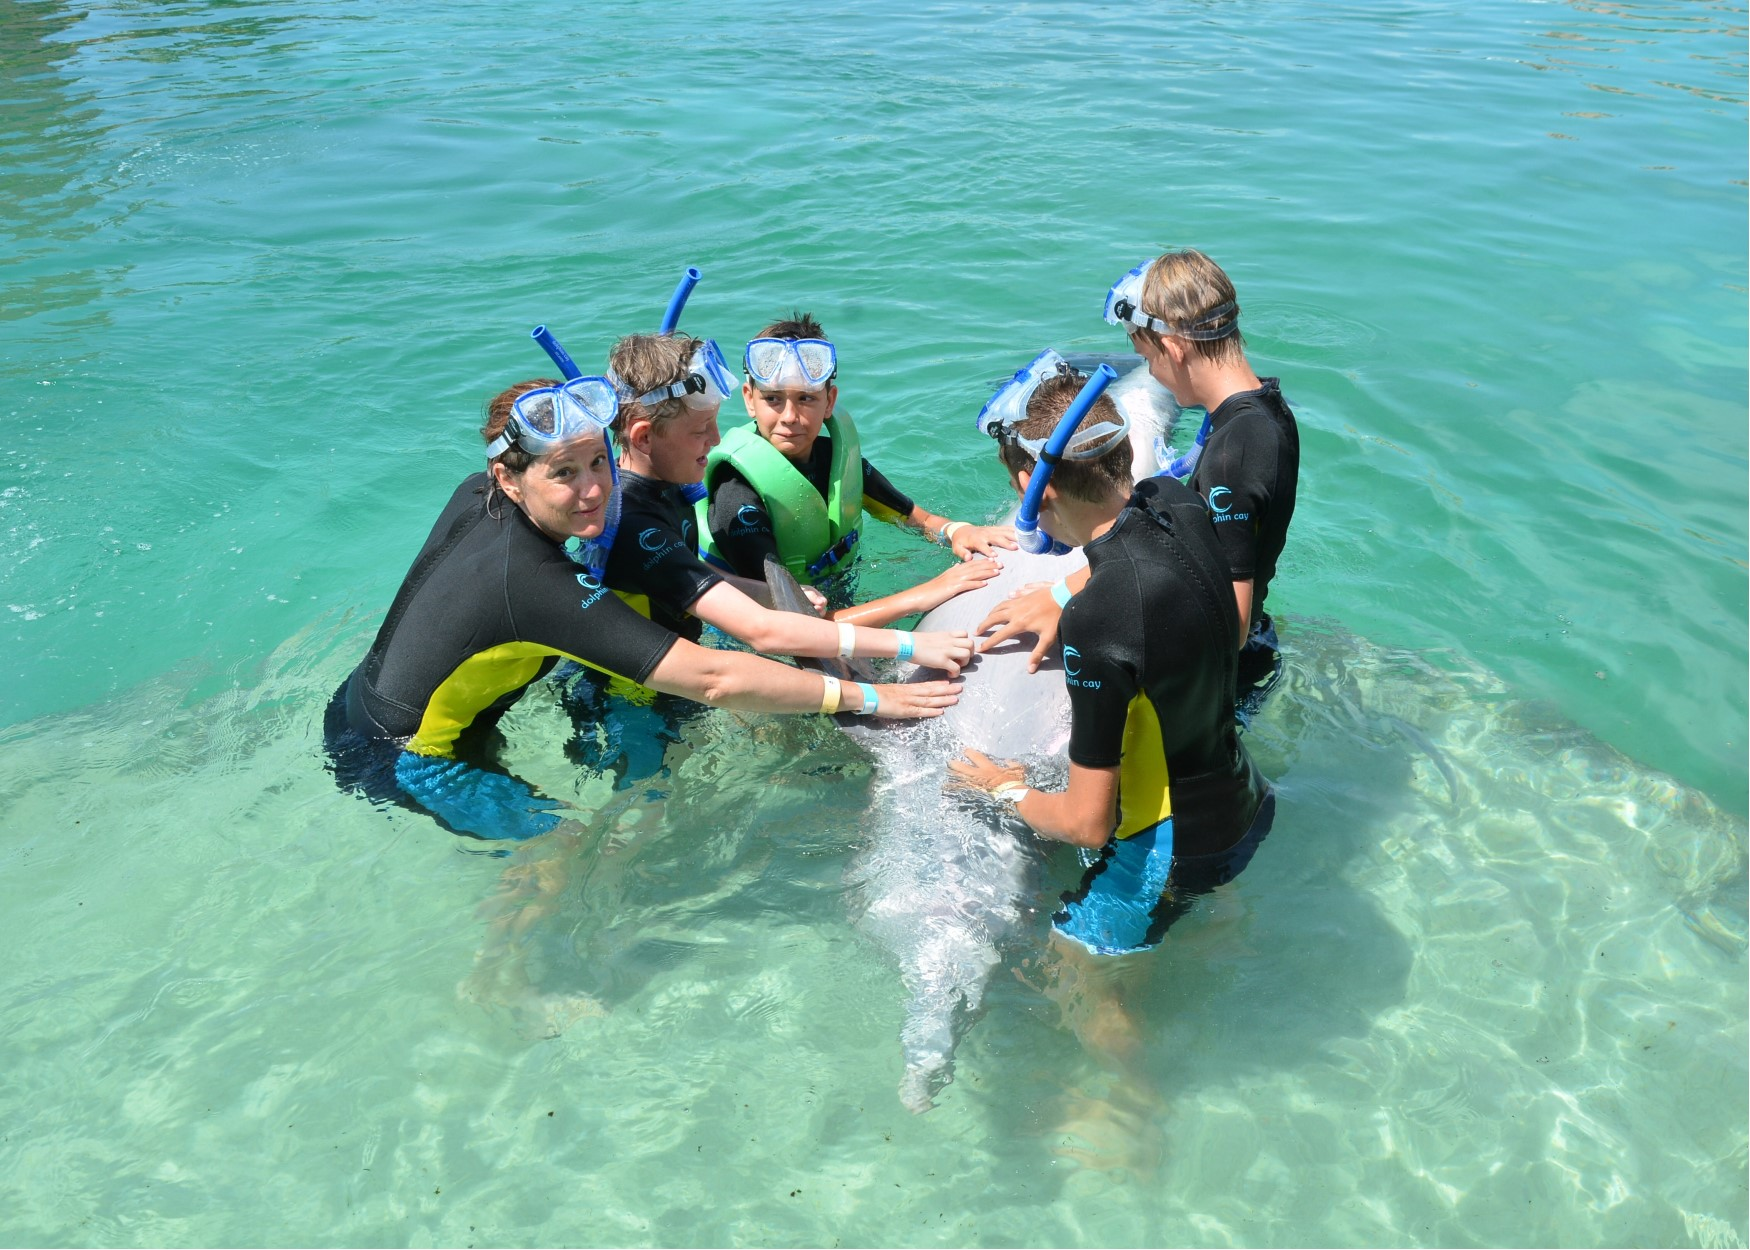 jardine boys petting dolphins.jpg